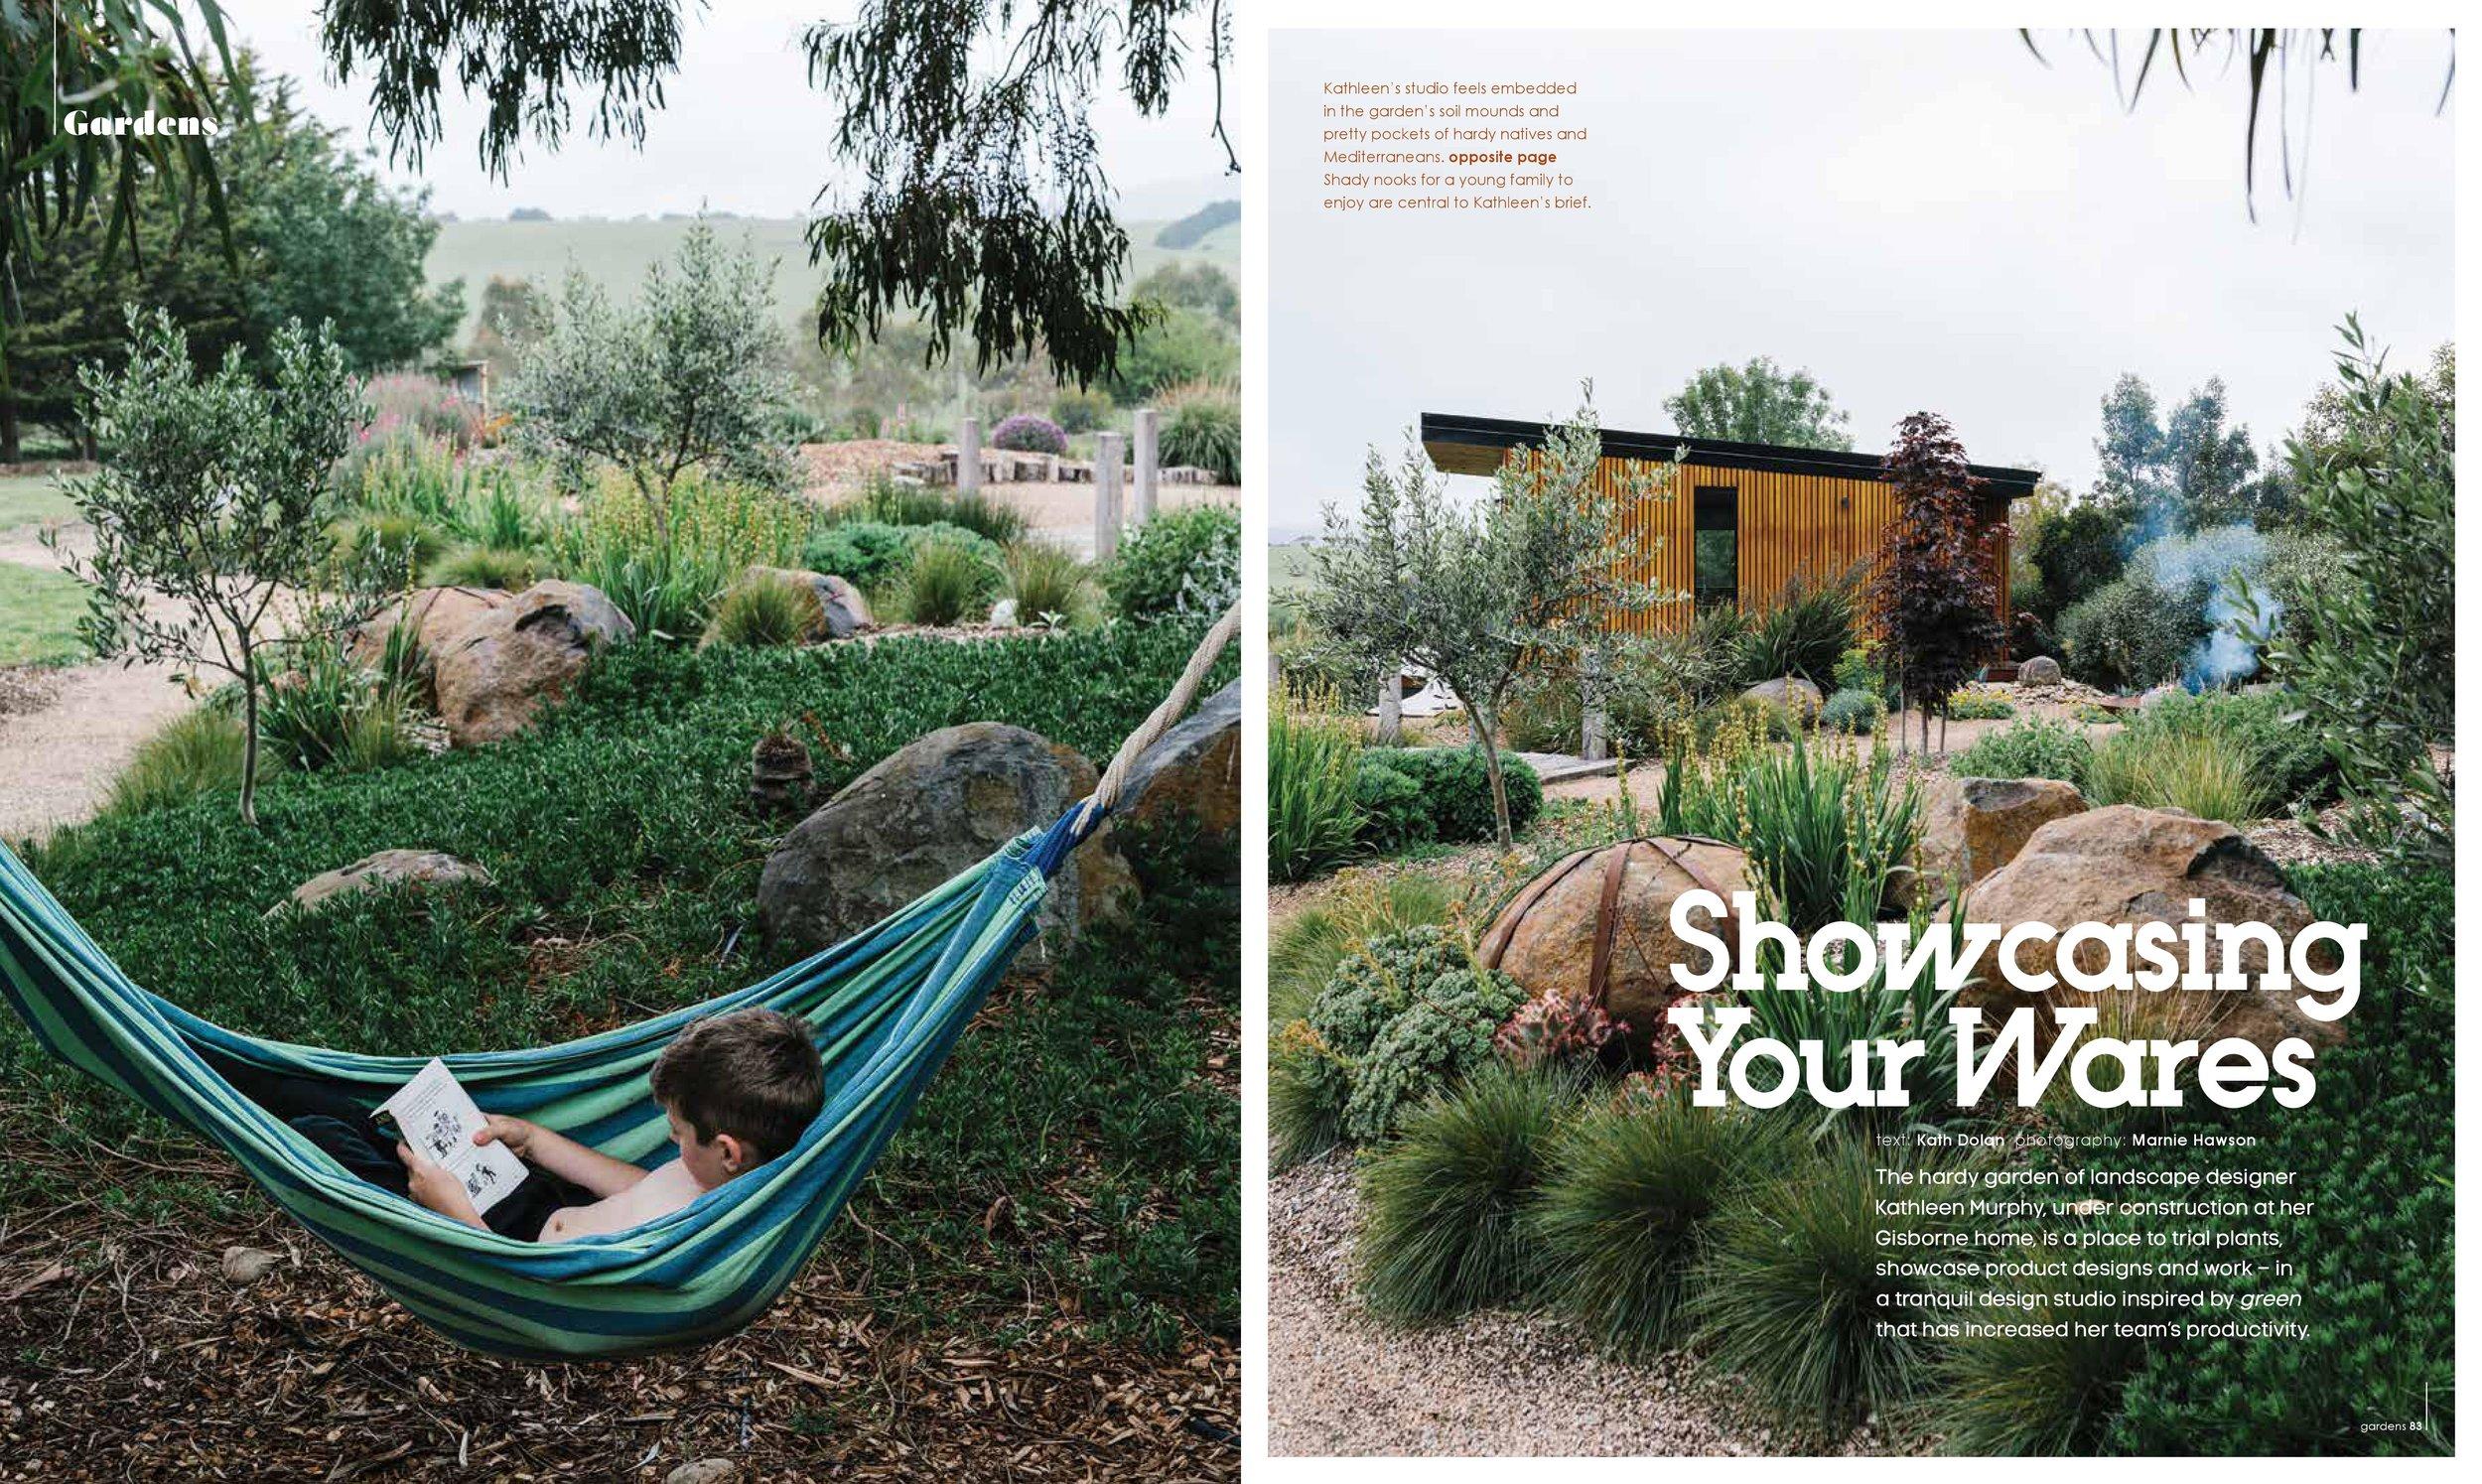 Marnie Hawson, Melbourne lifestyle photographer for Kathleen Murphy Landscape Design and Green MagazineMarnie Hawson, Melbourne lifestyle photographer for Kathleen Murphy Landscape Design and Green Magazine